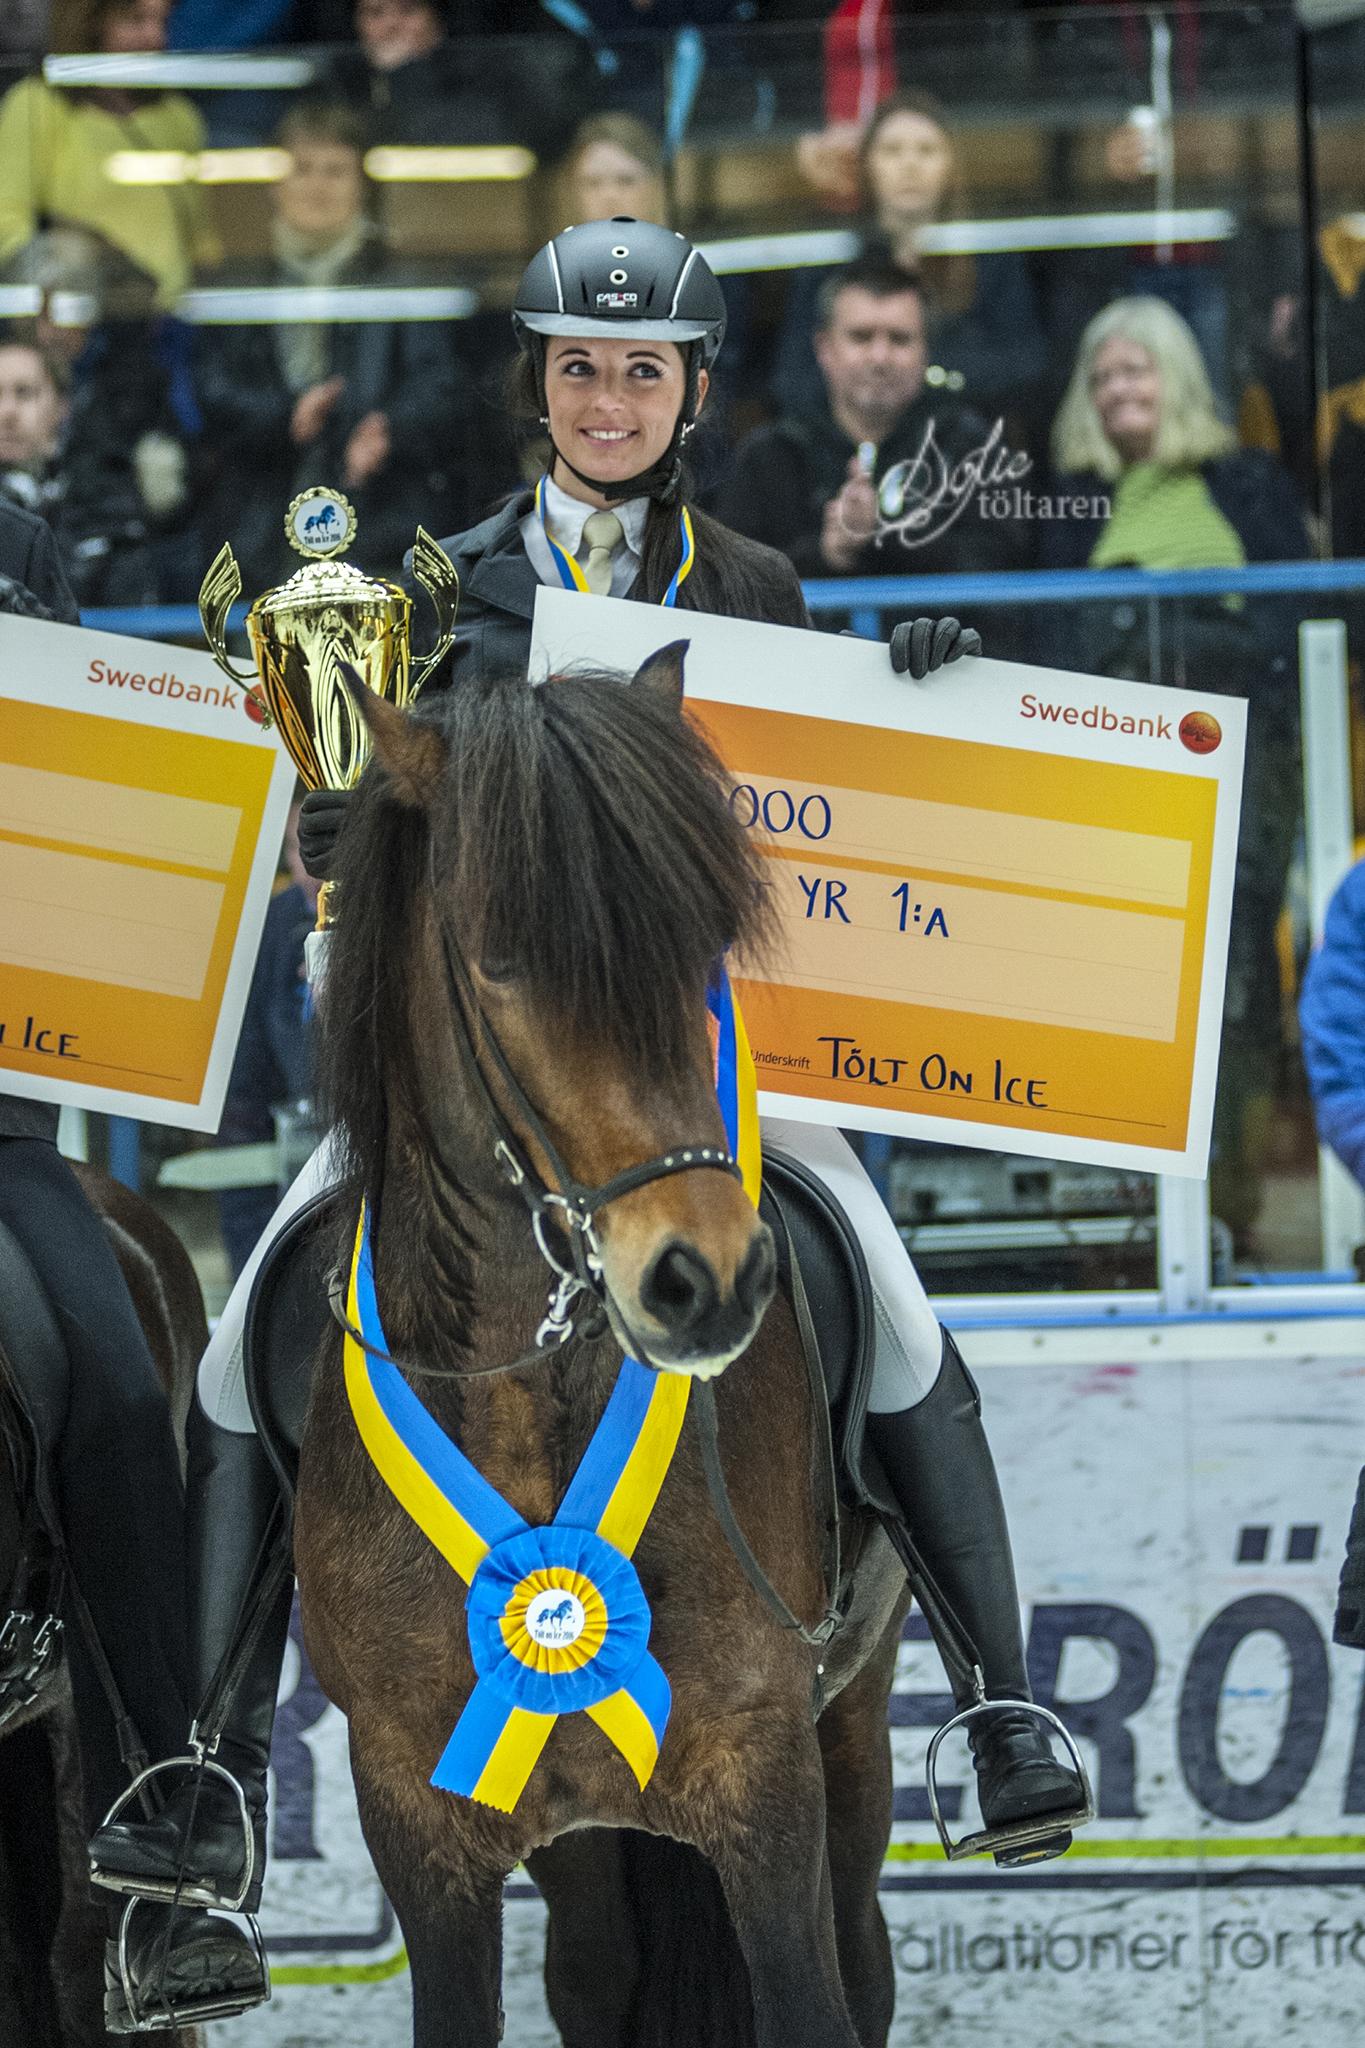 Vinnaren Frederike, 10.000 kronor rikare. Hennes Börkur ser nöjd ut Foto: Sofie Lahtinen Carlsson/www.toltaren.wordpress.com